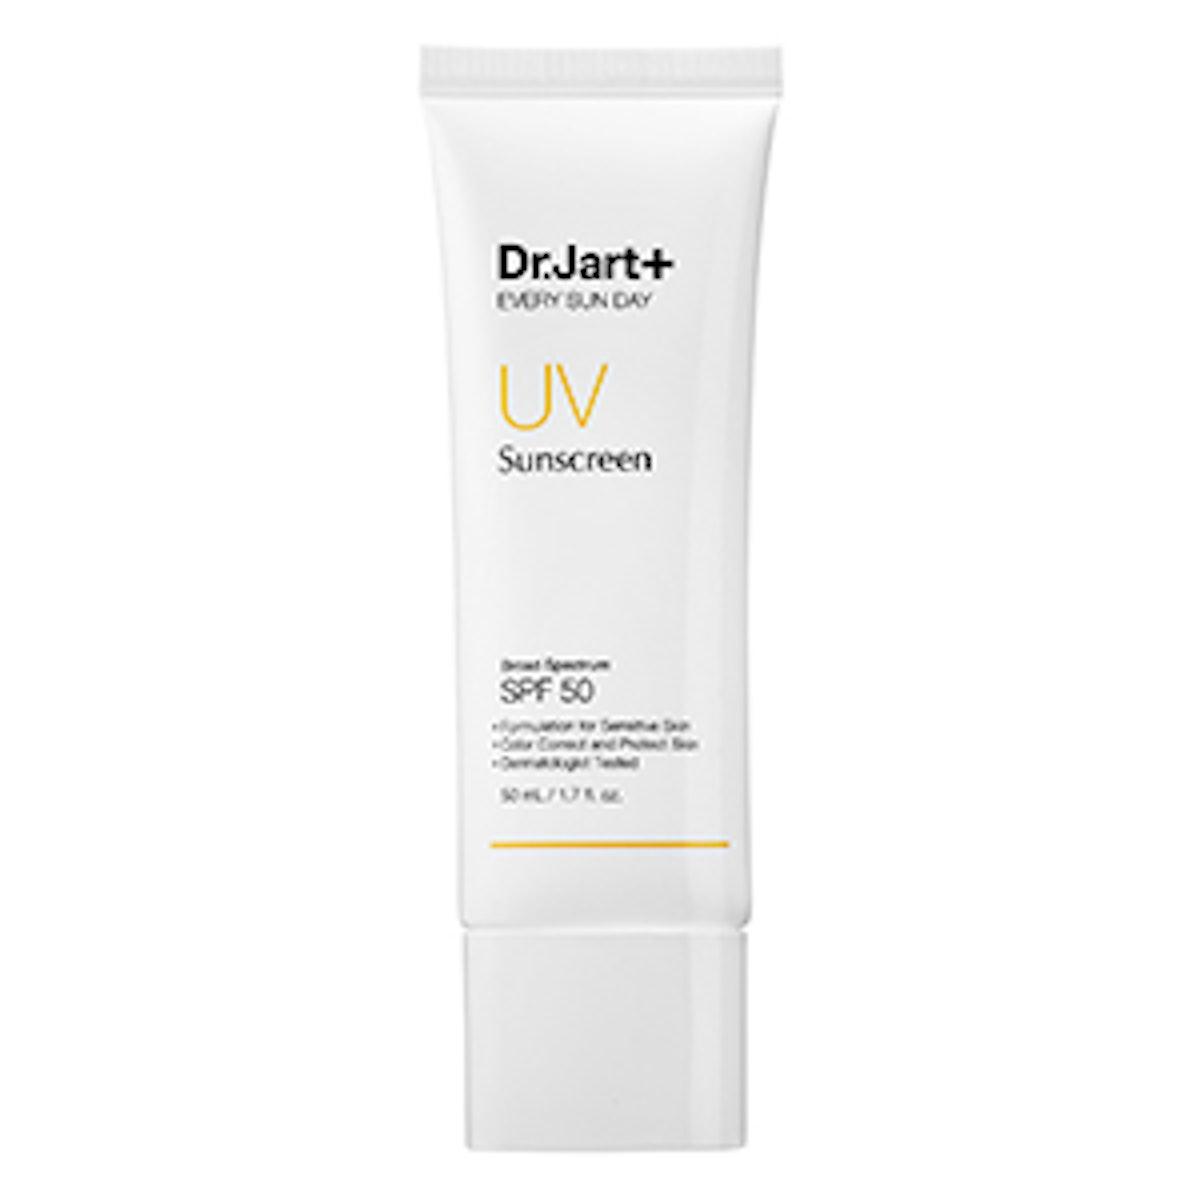 Every Sun Day UV Sunscreen Broad Spectrum 50